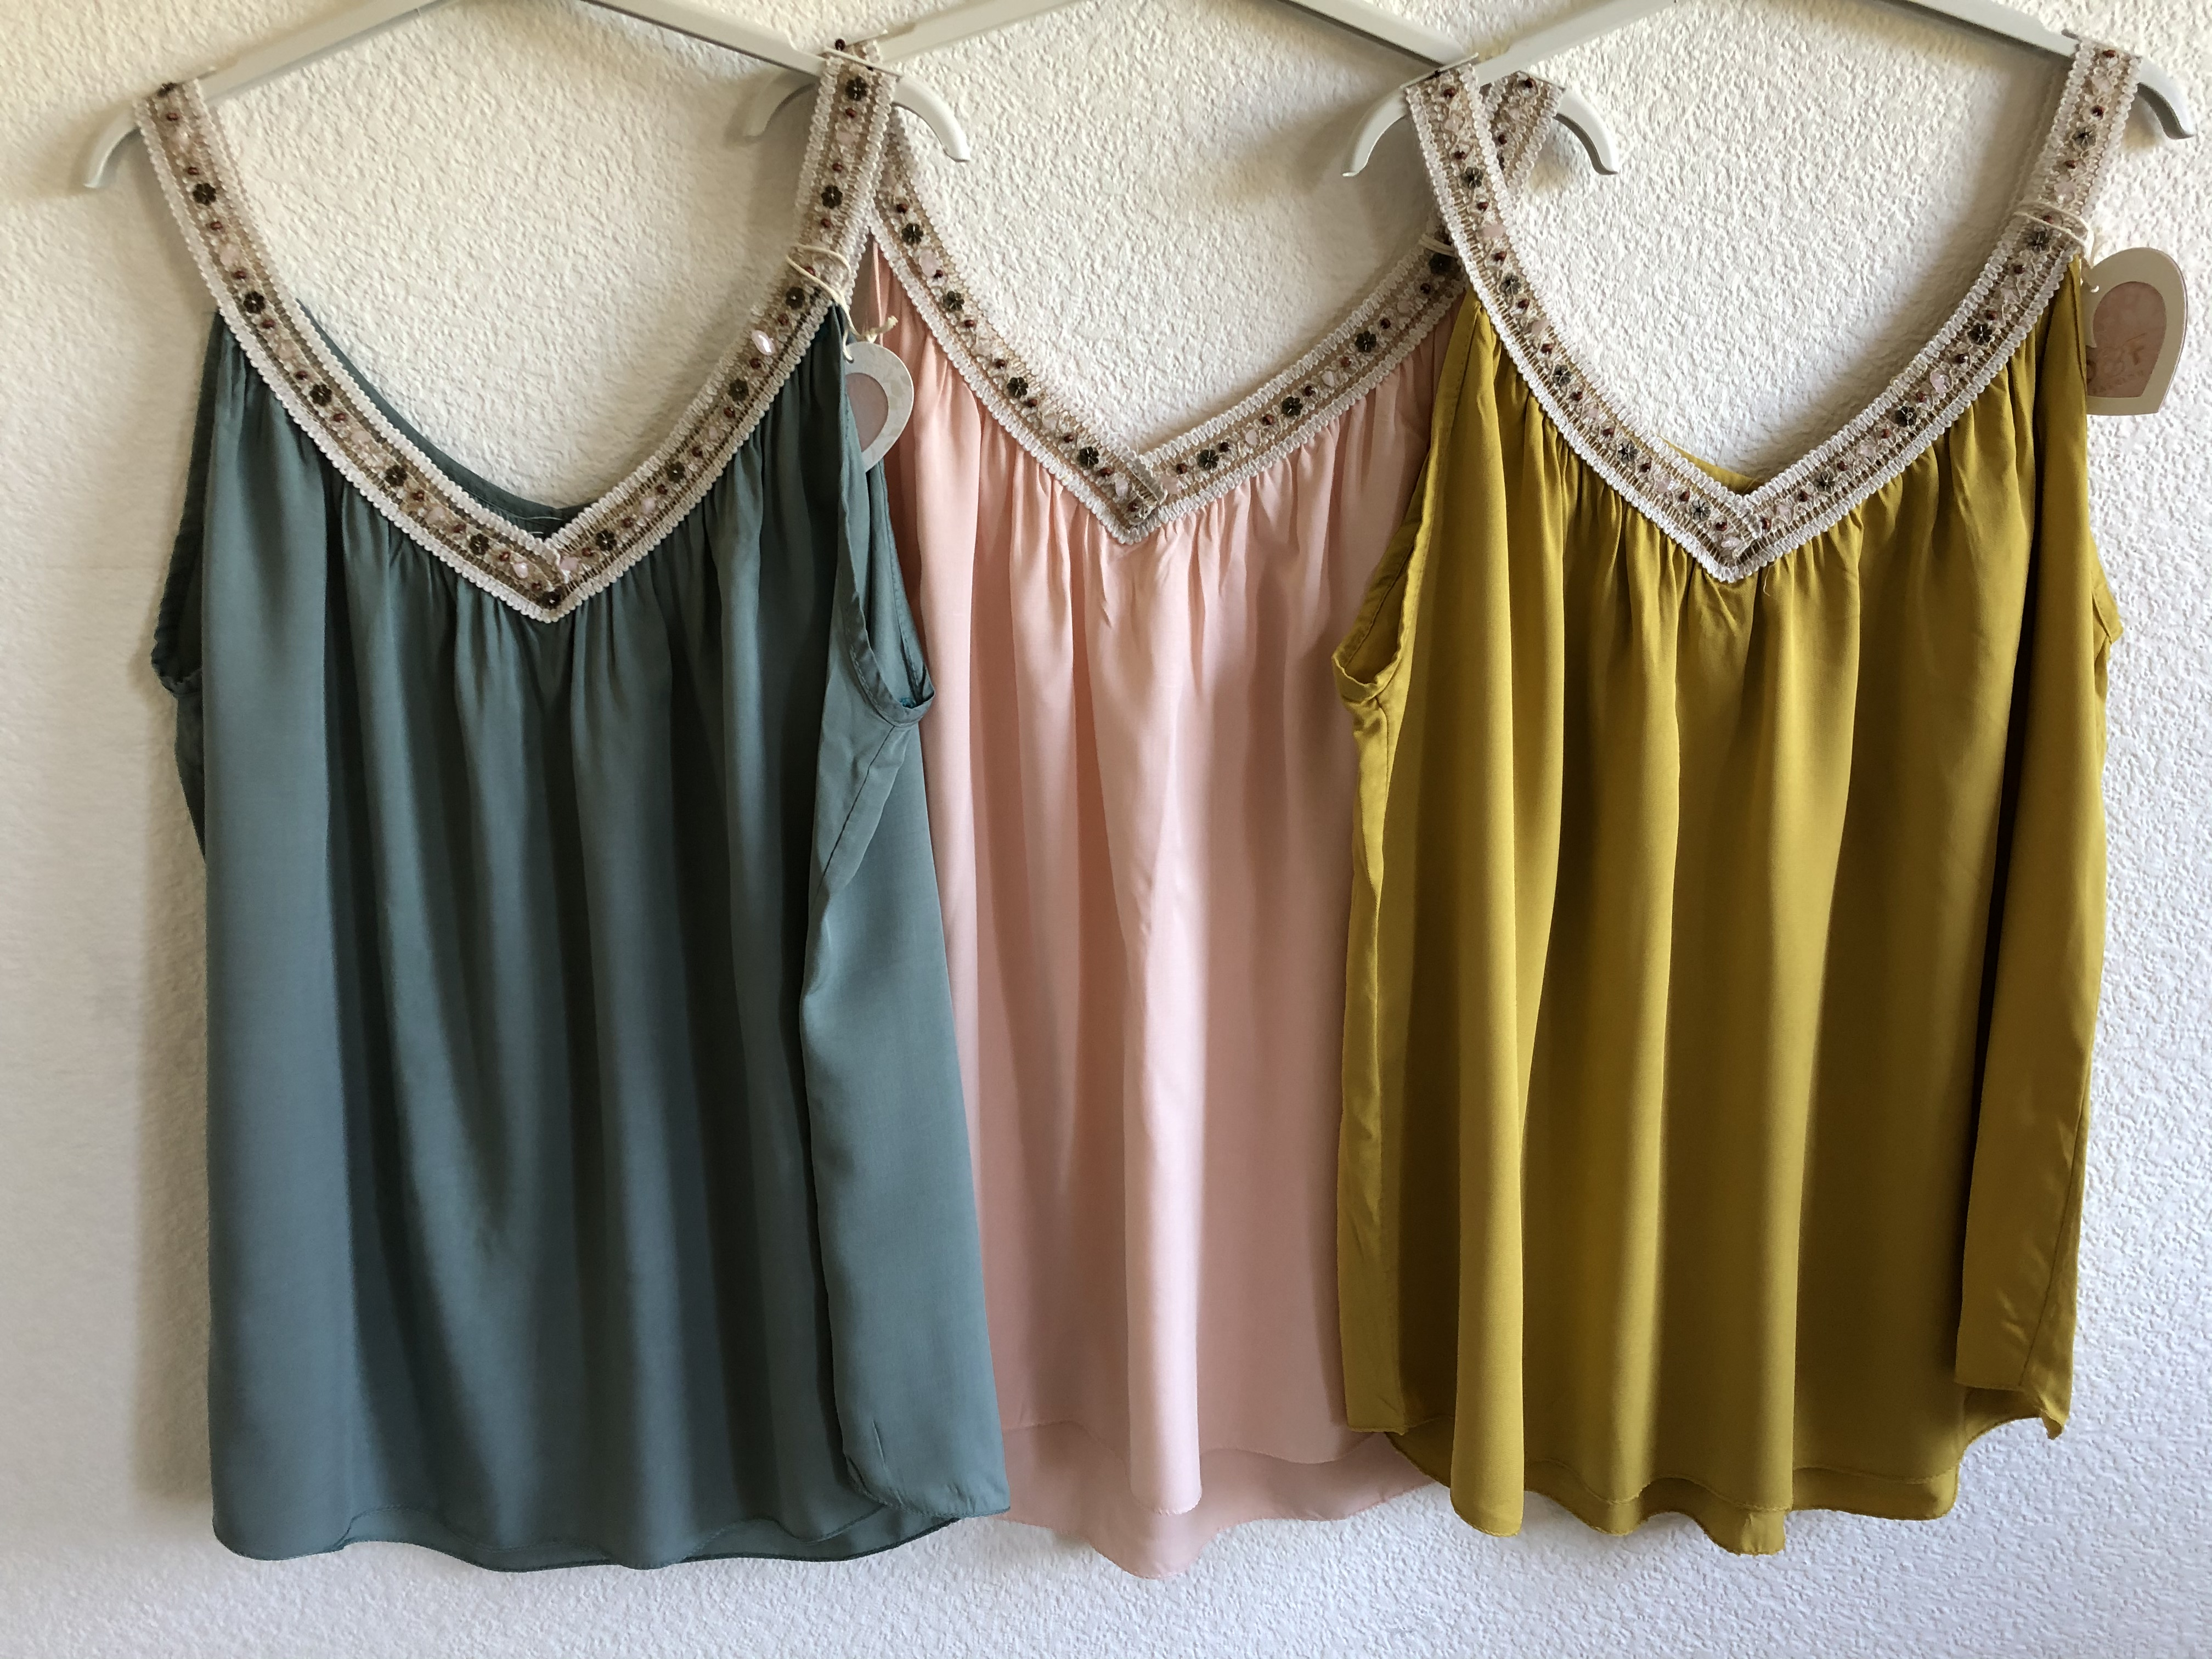 Boho Top • One Size bis Gr. 42 • 4 Farben